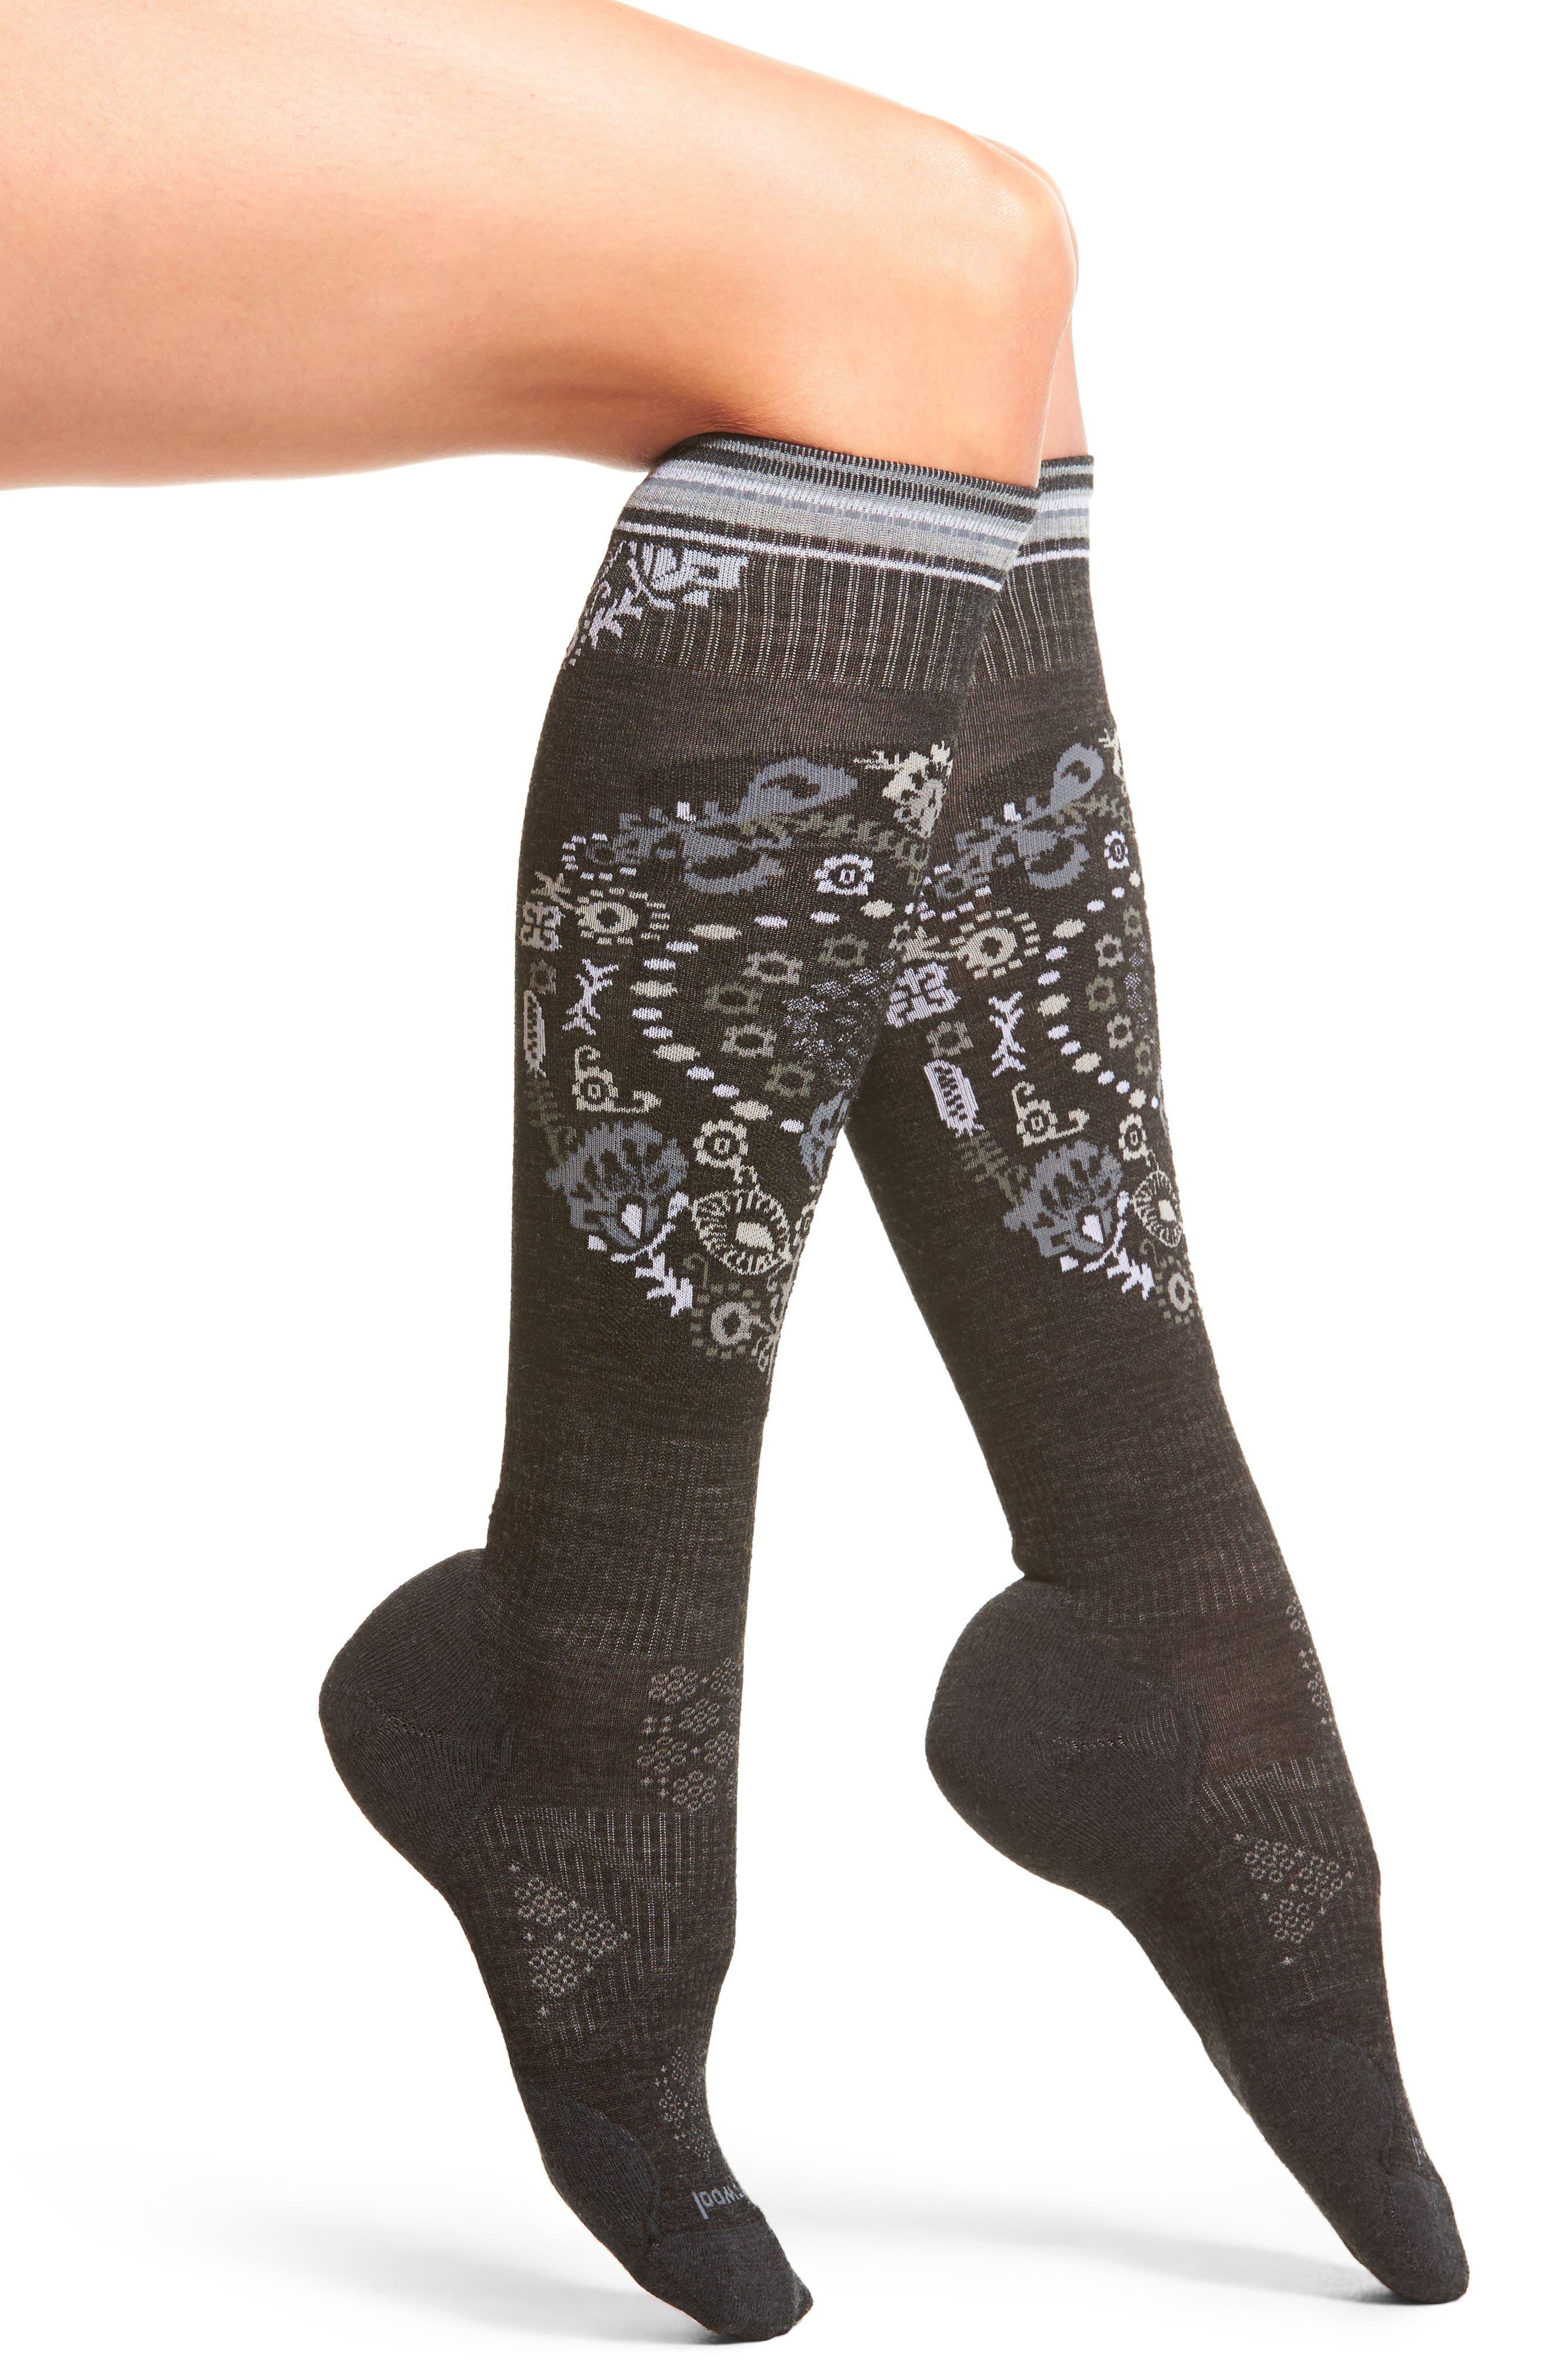 PhD<sup>®</sup> Ski Light Elite Paisley Socks,                             Main thumbnail 1, color,                             Charcoal